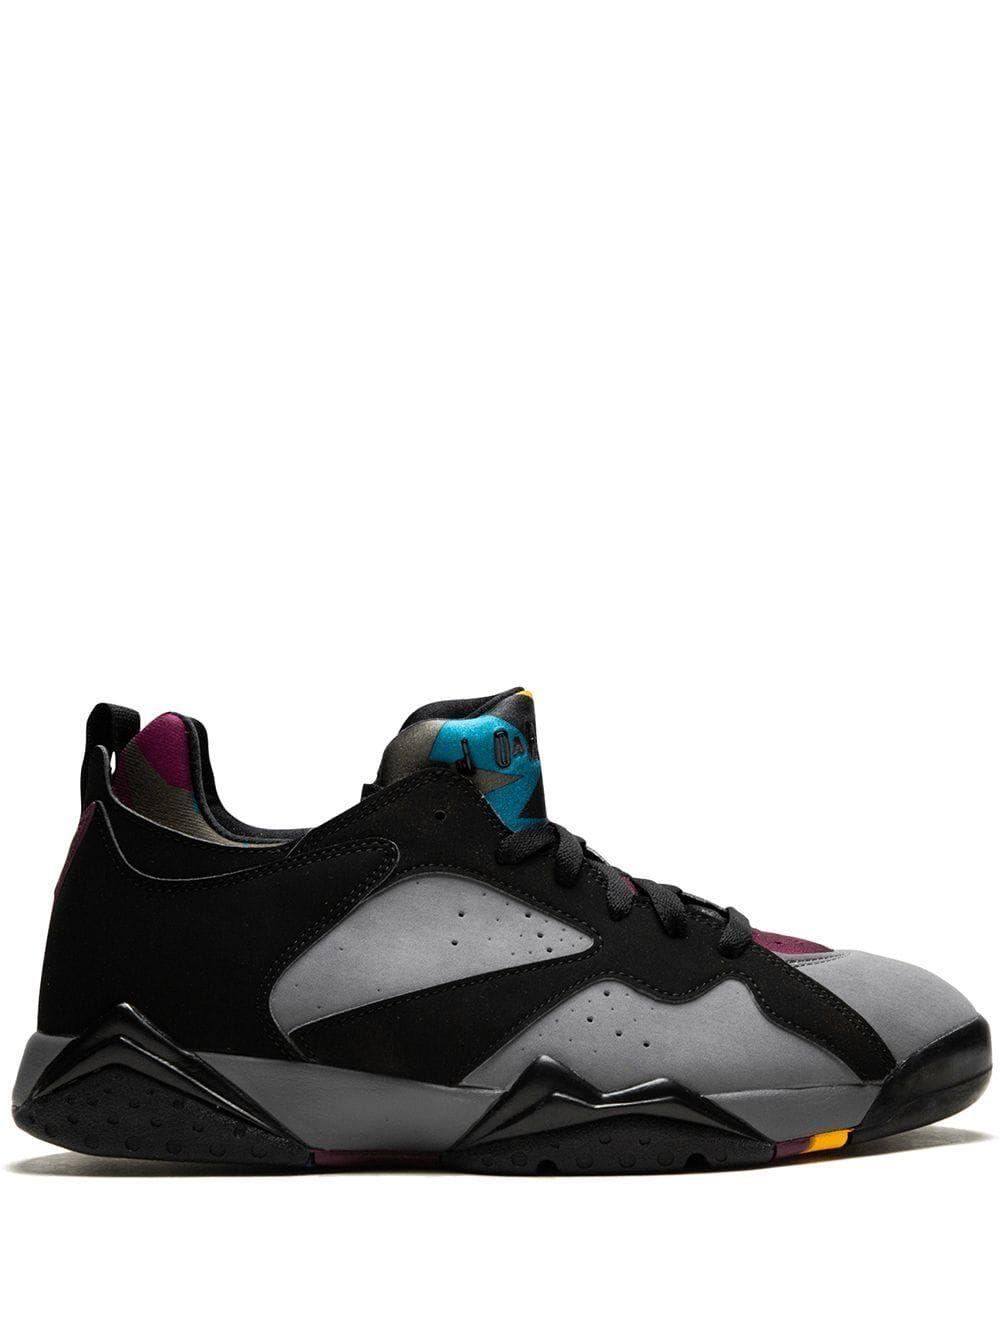 aea3450144b JORDAN JORDAN AIR JORDAN 7 LOW NRG SNEAKERS - BLACK. #jordan #shoes ...